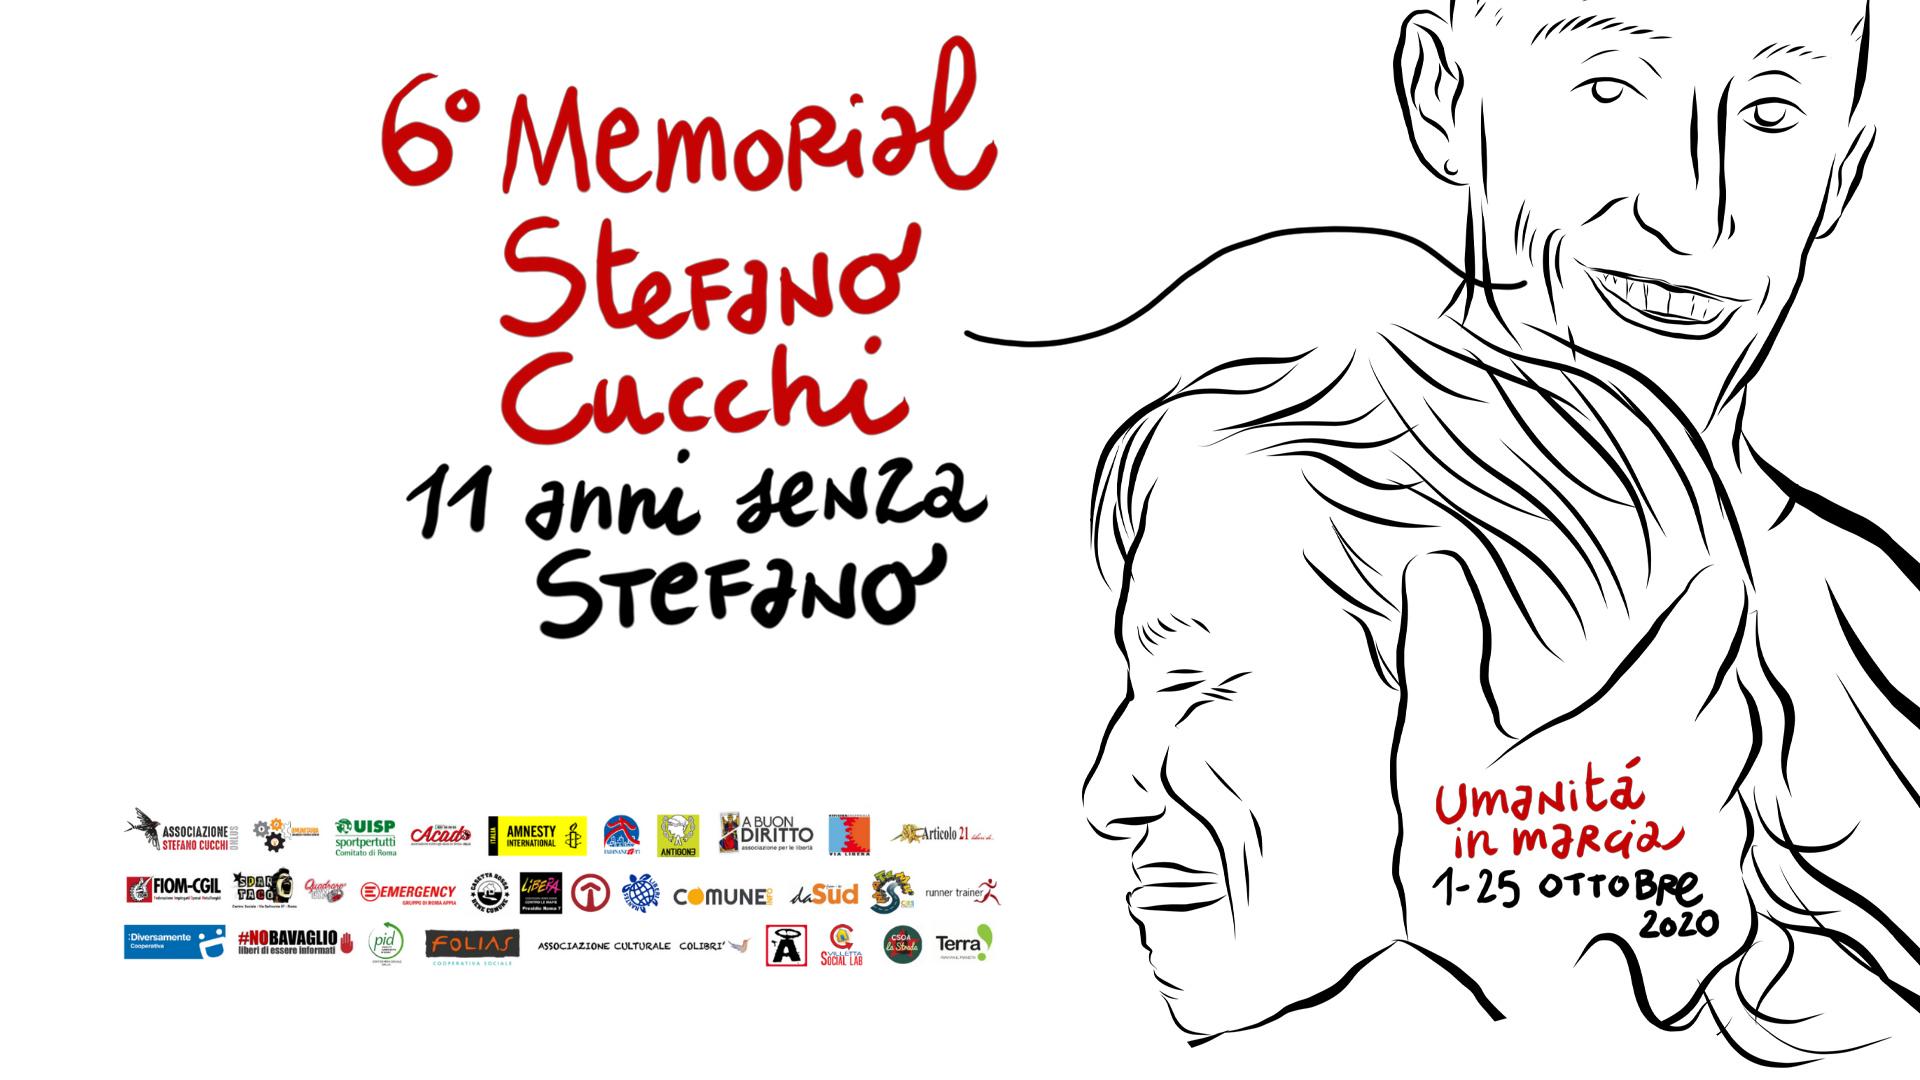 6° Memorial Stefano Cucchi